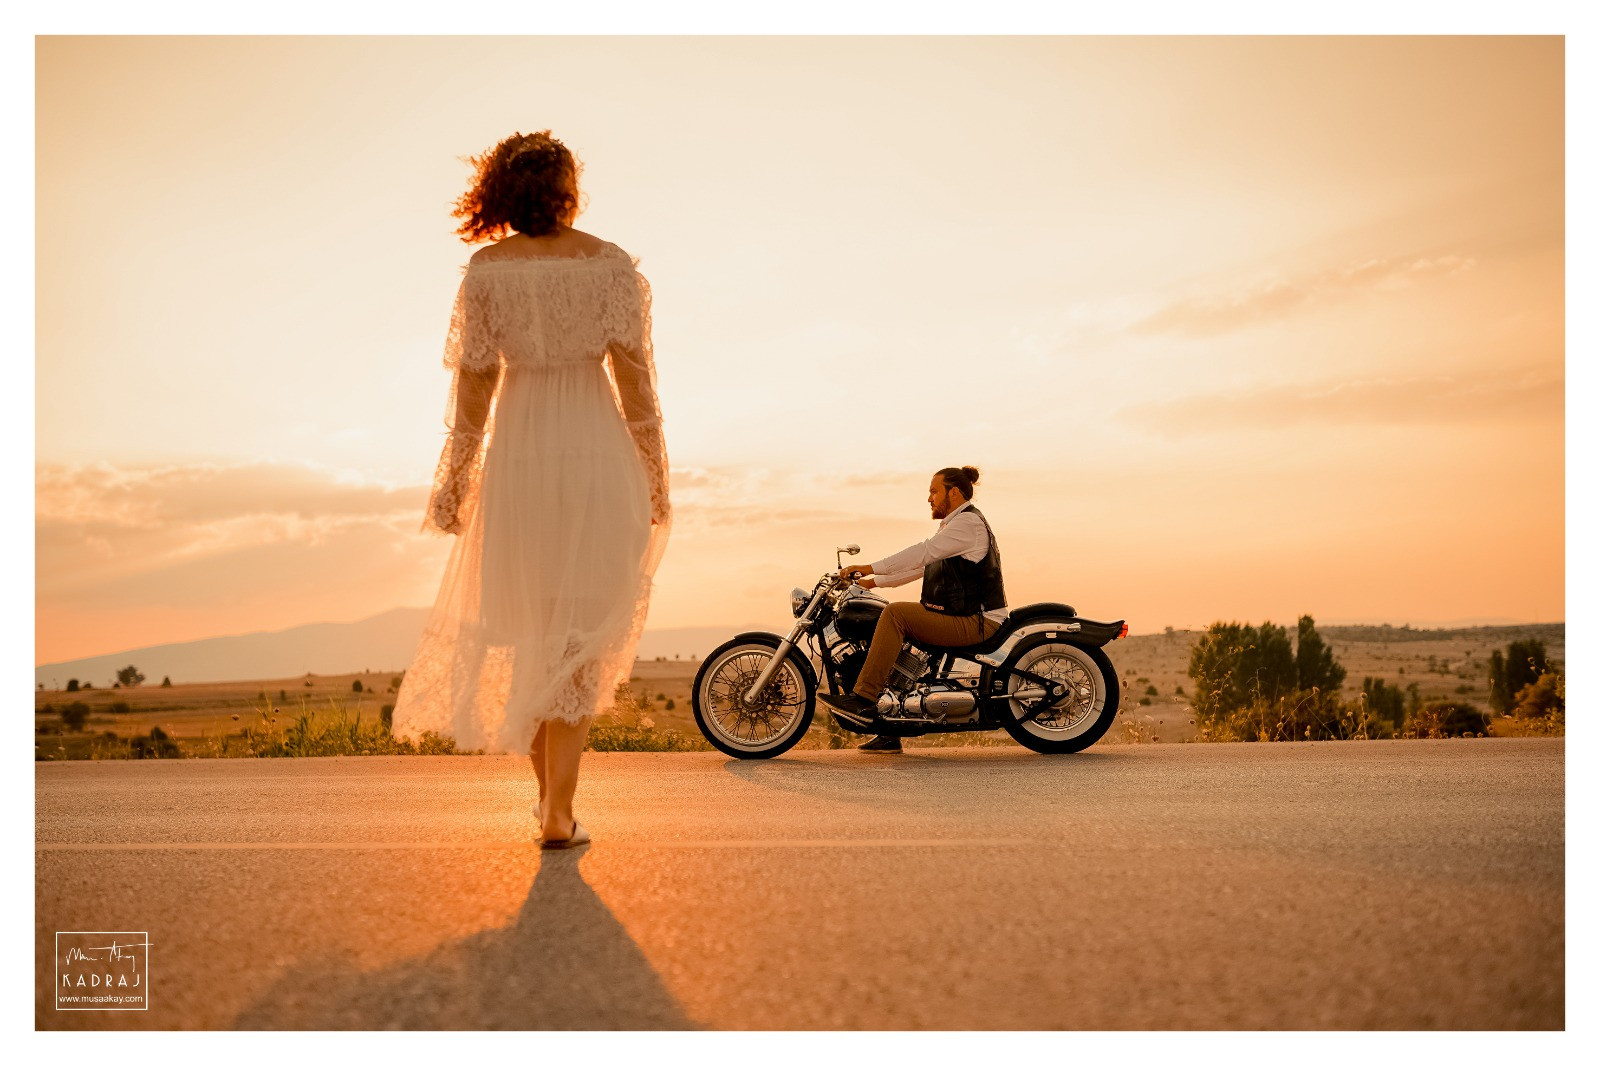 Motorbike.jpeg